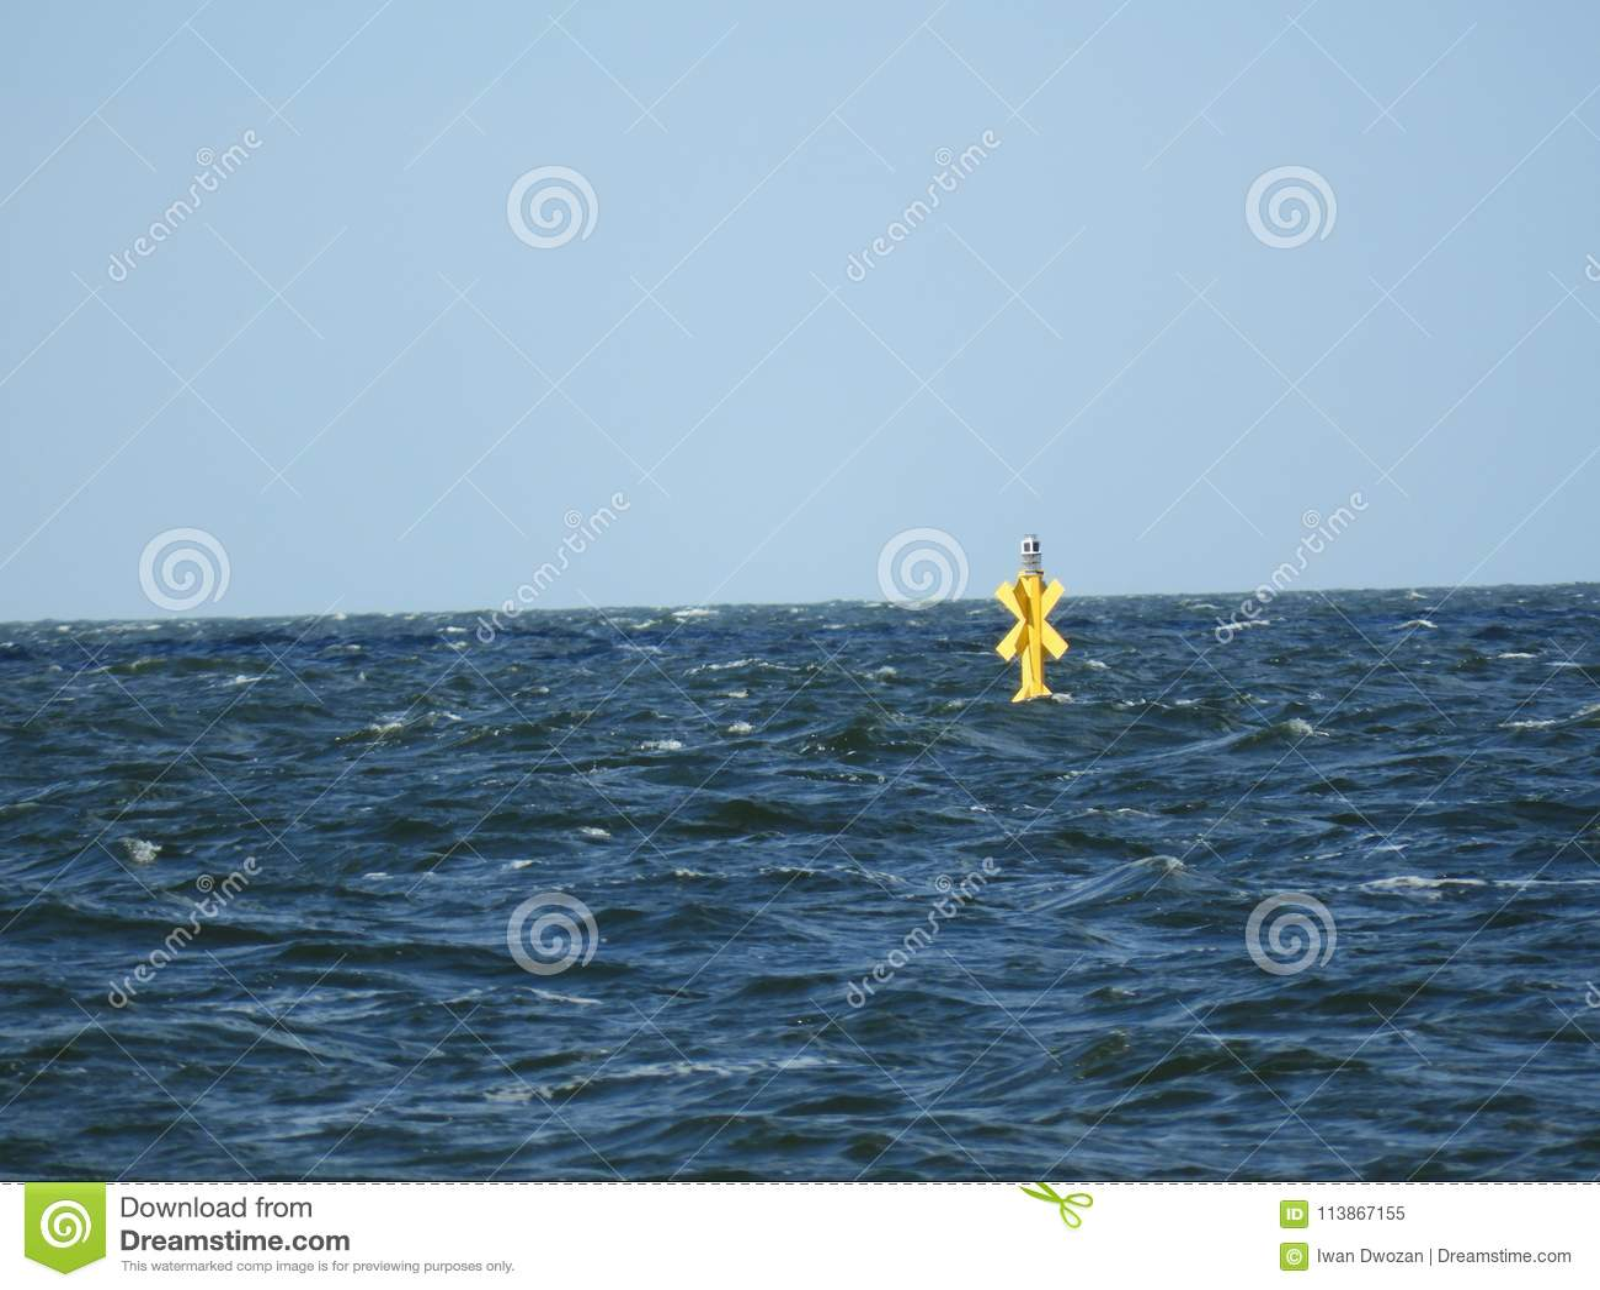 Yellow Sea Water Windmill Blue Sky Stock Image - Image of